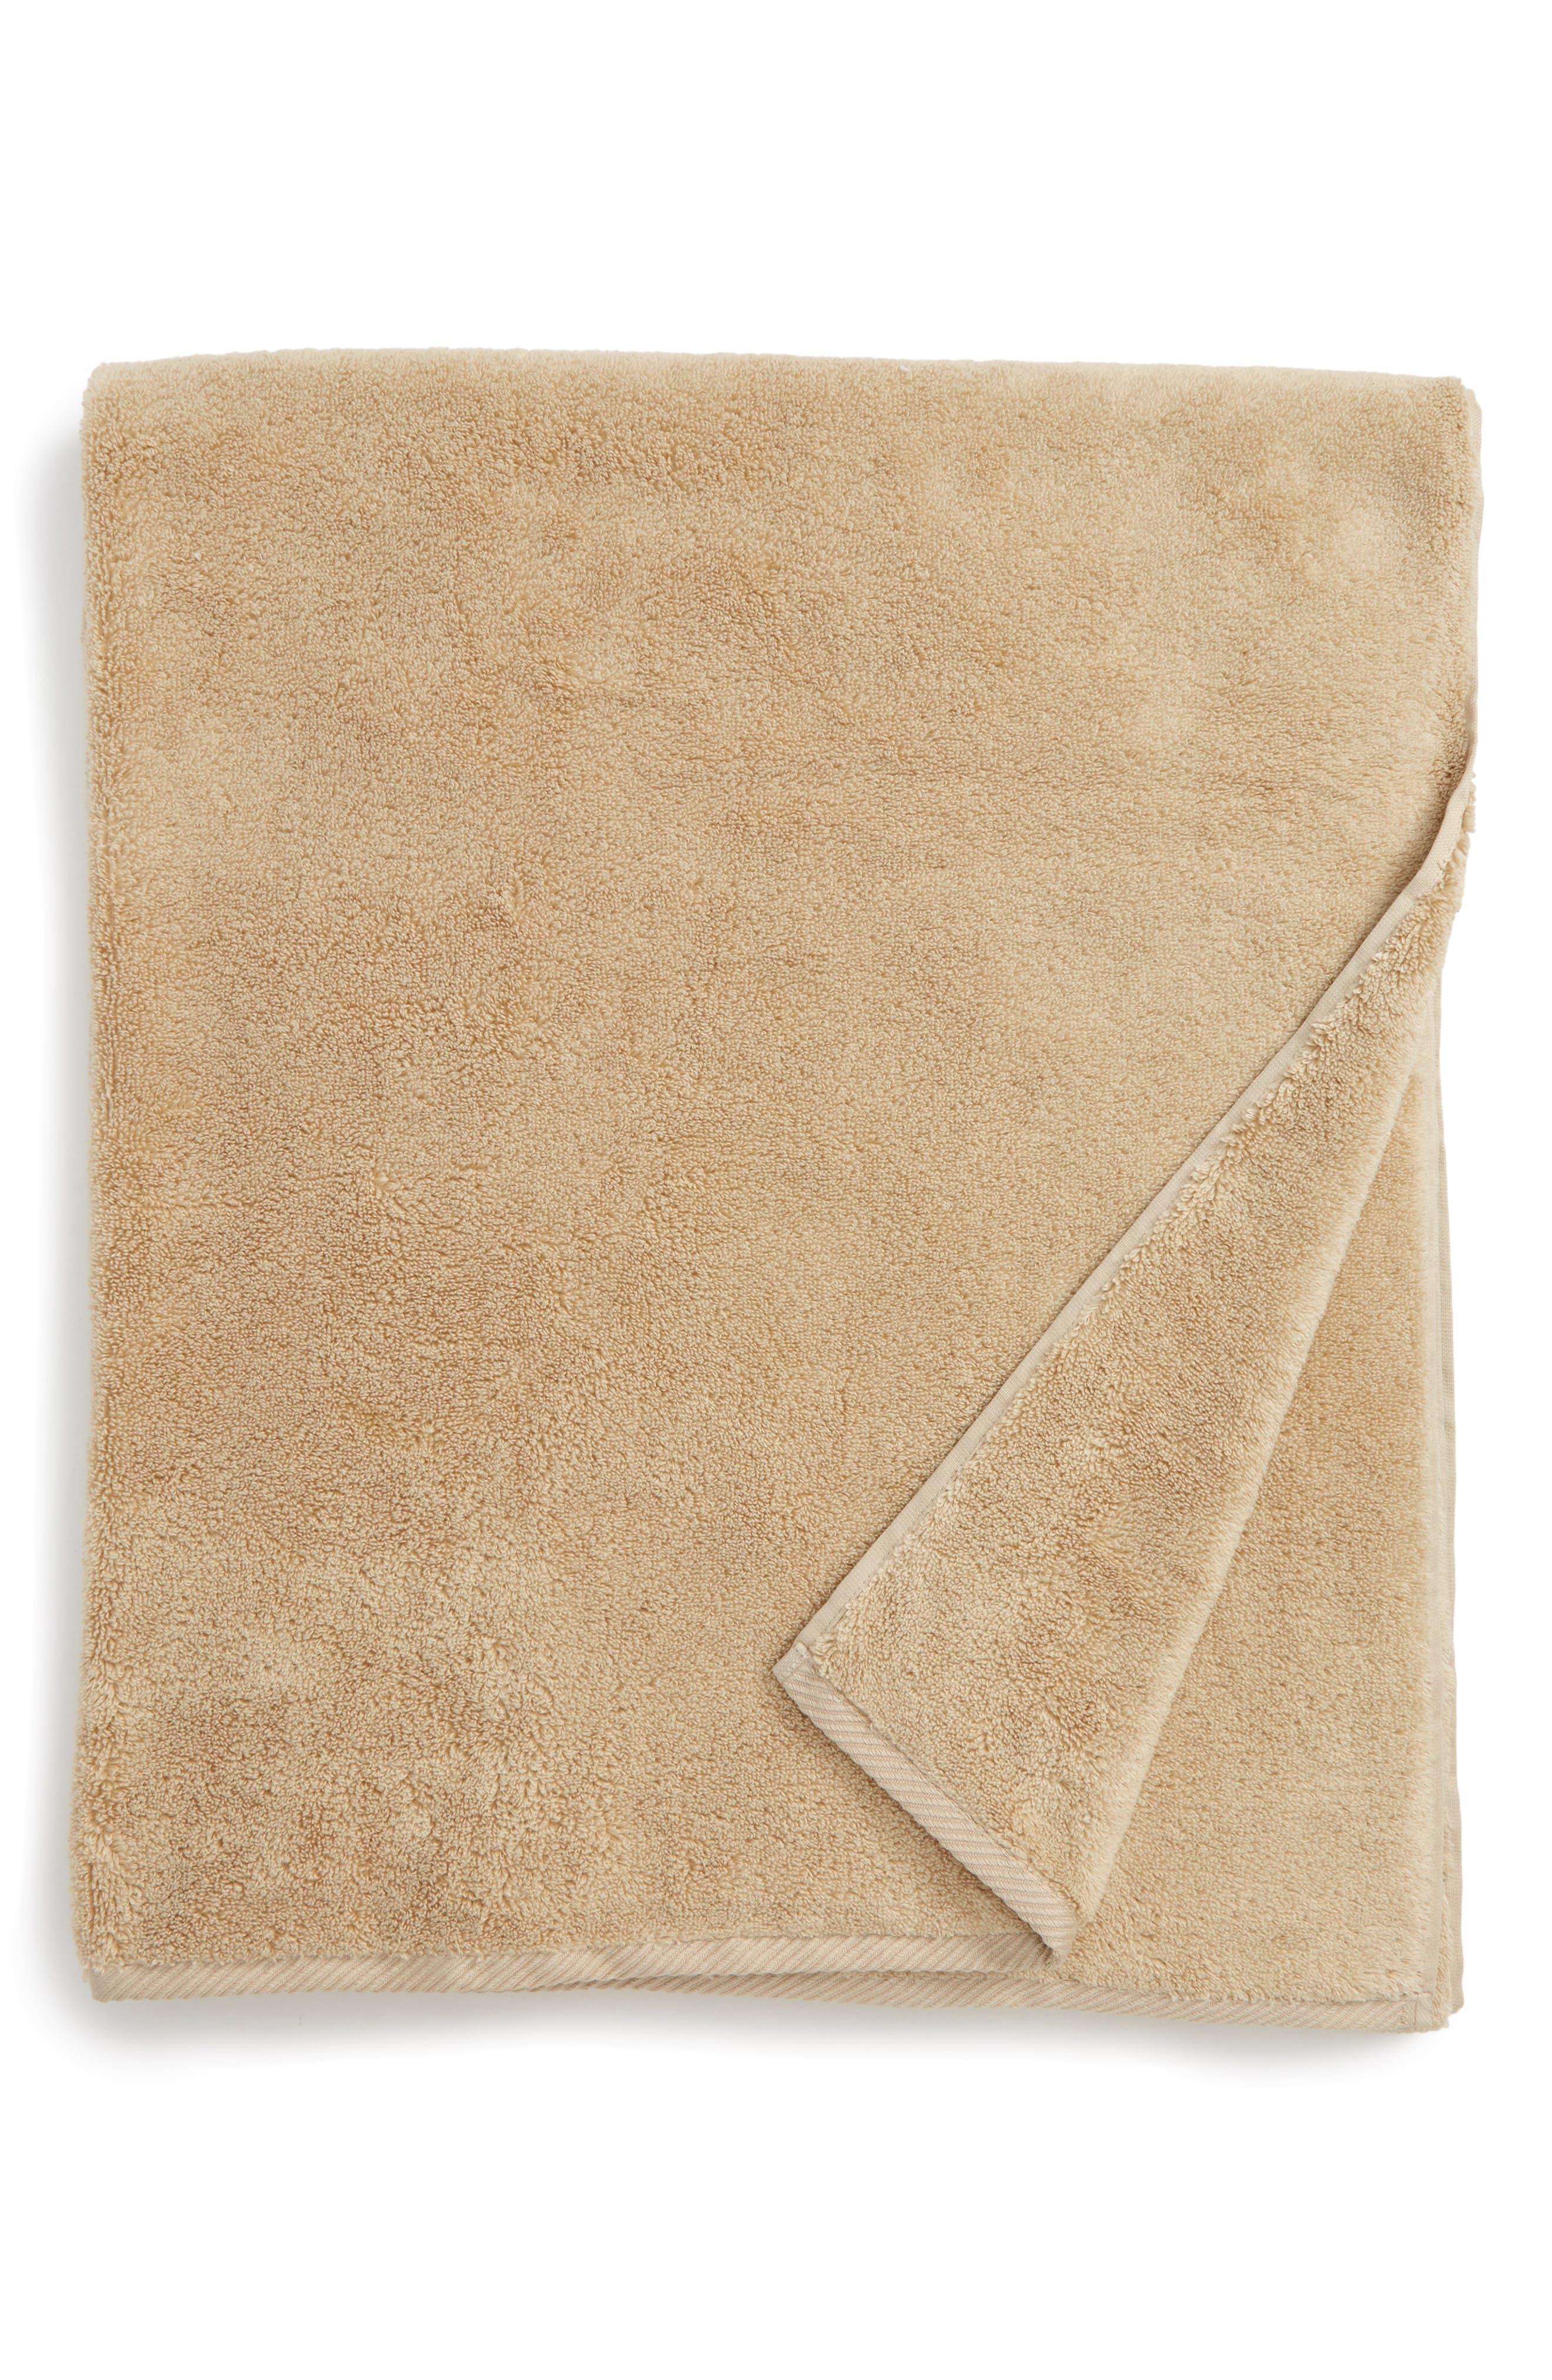 Milagro Bath Sheet,                         Main,                         color, LINEN